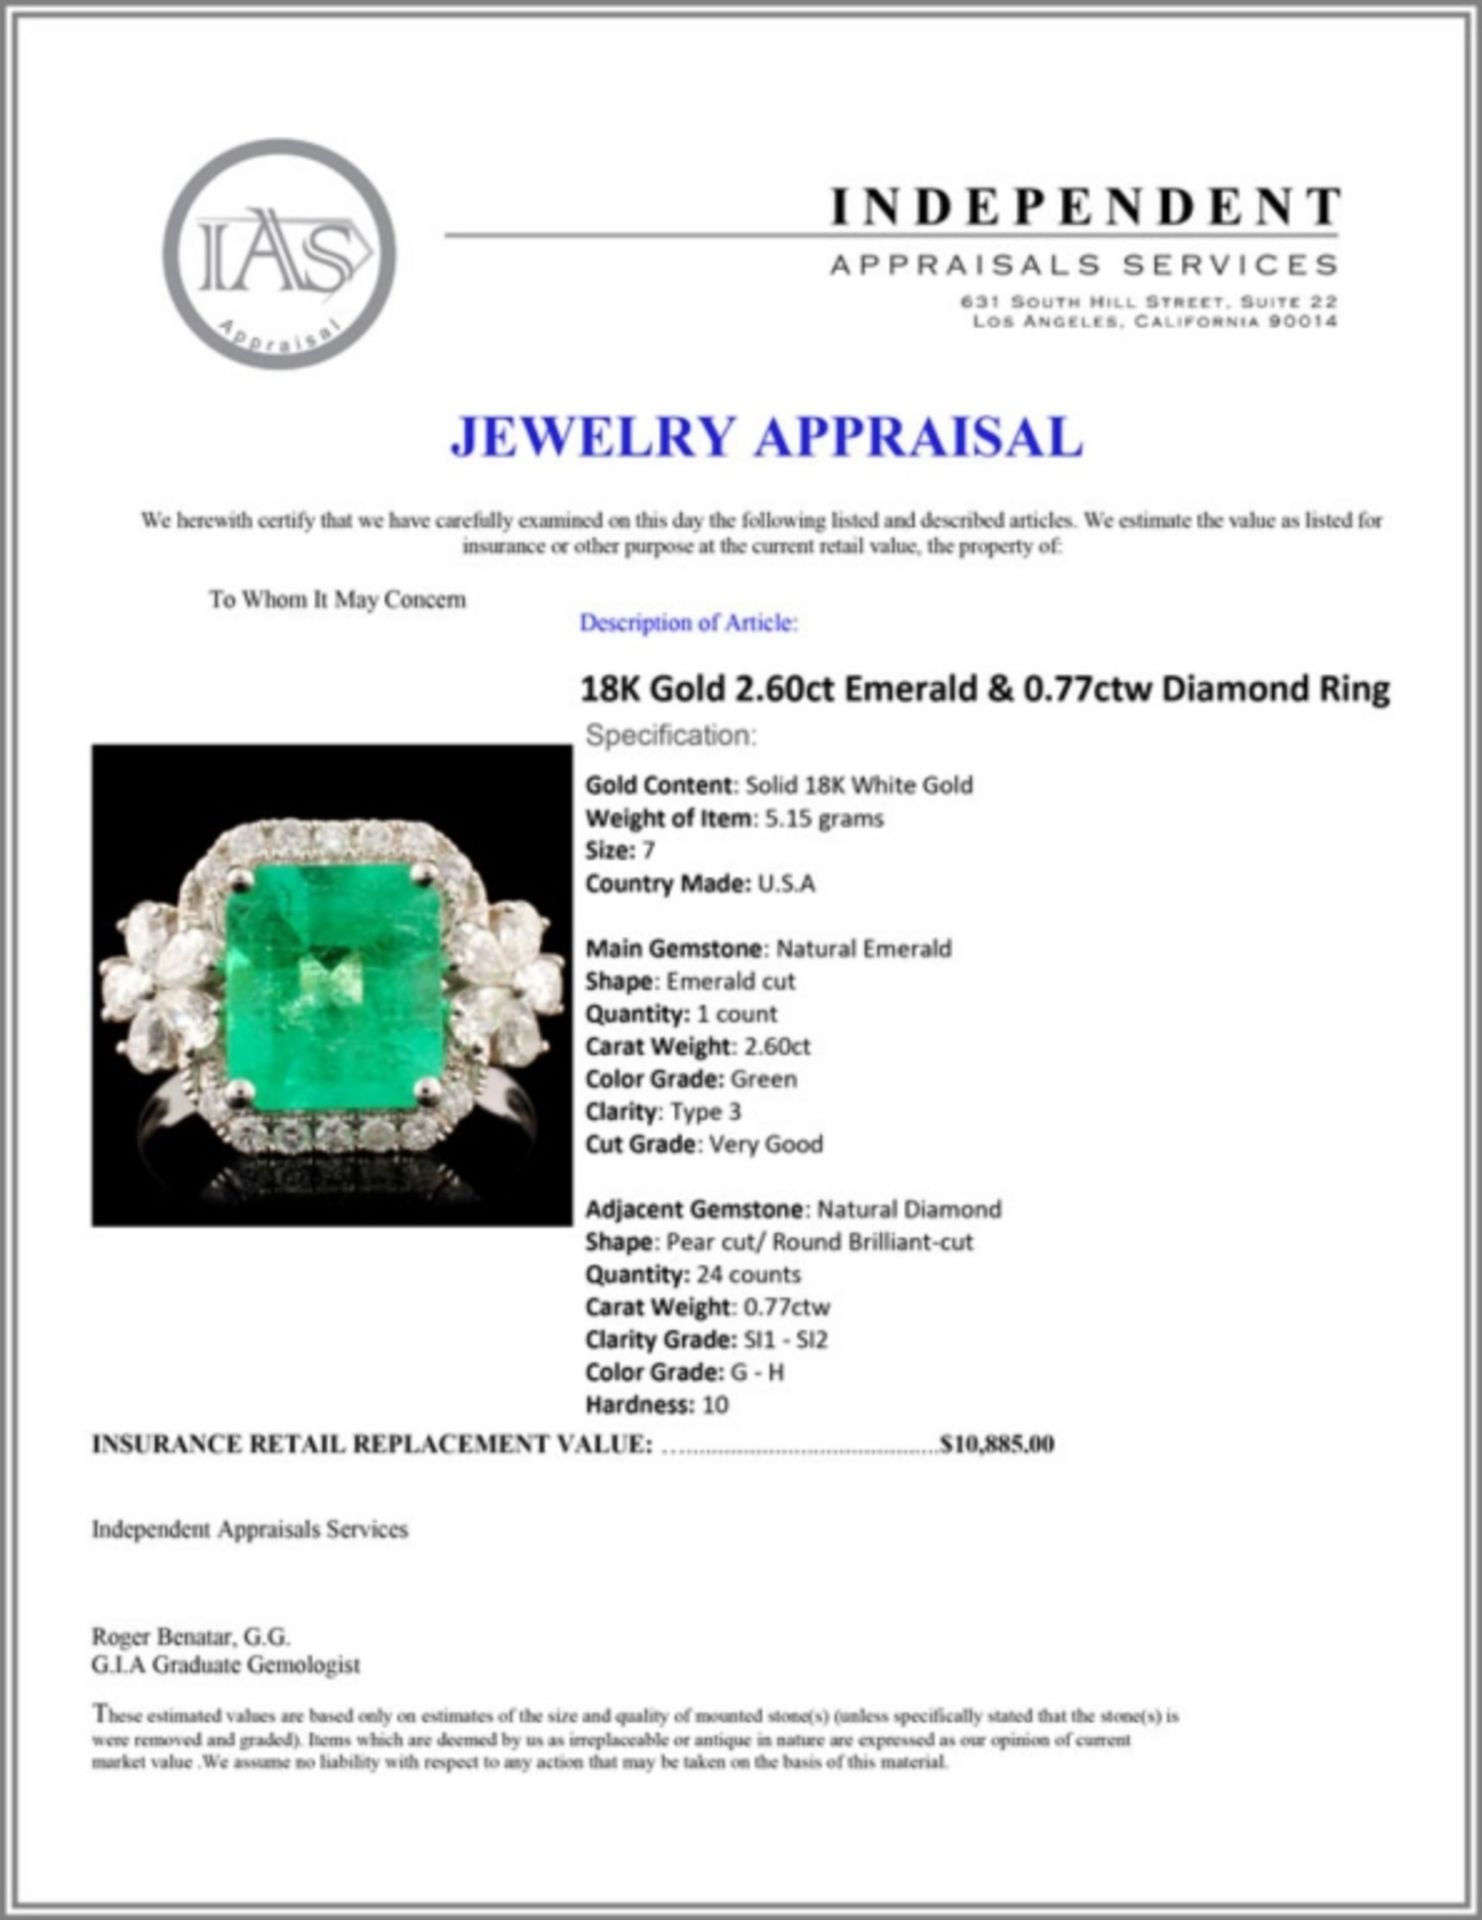 18K Gold 2.60ct Emerald & 0.77ctw Diamond Ring - Image 5 of 5